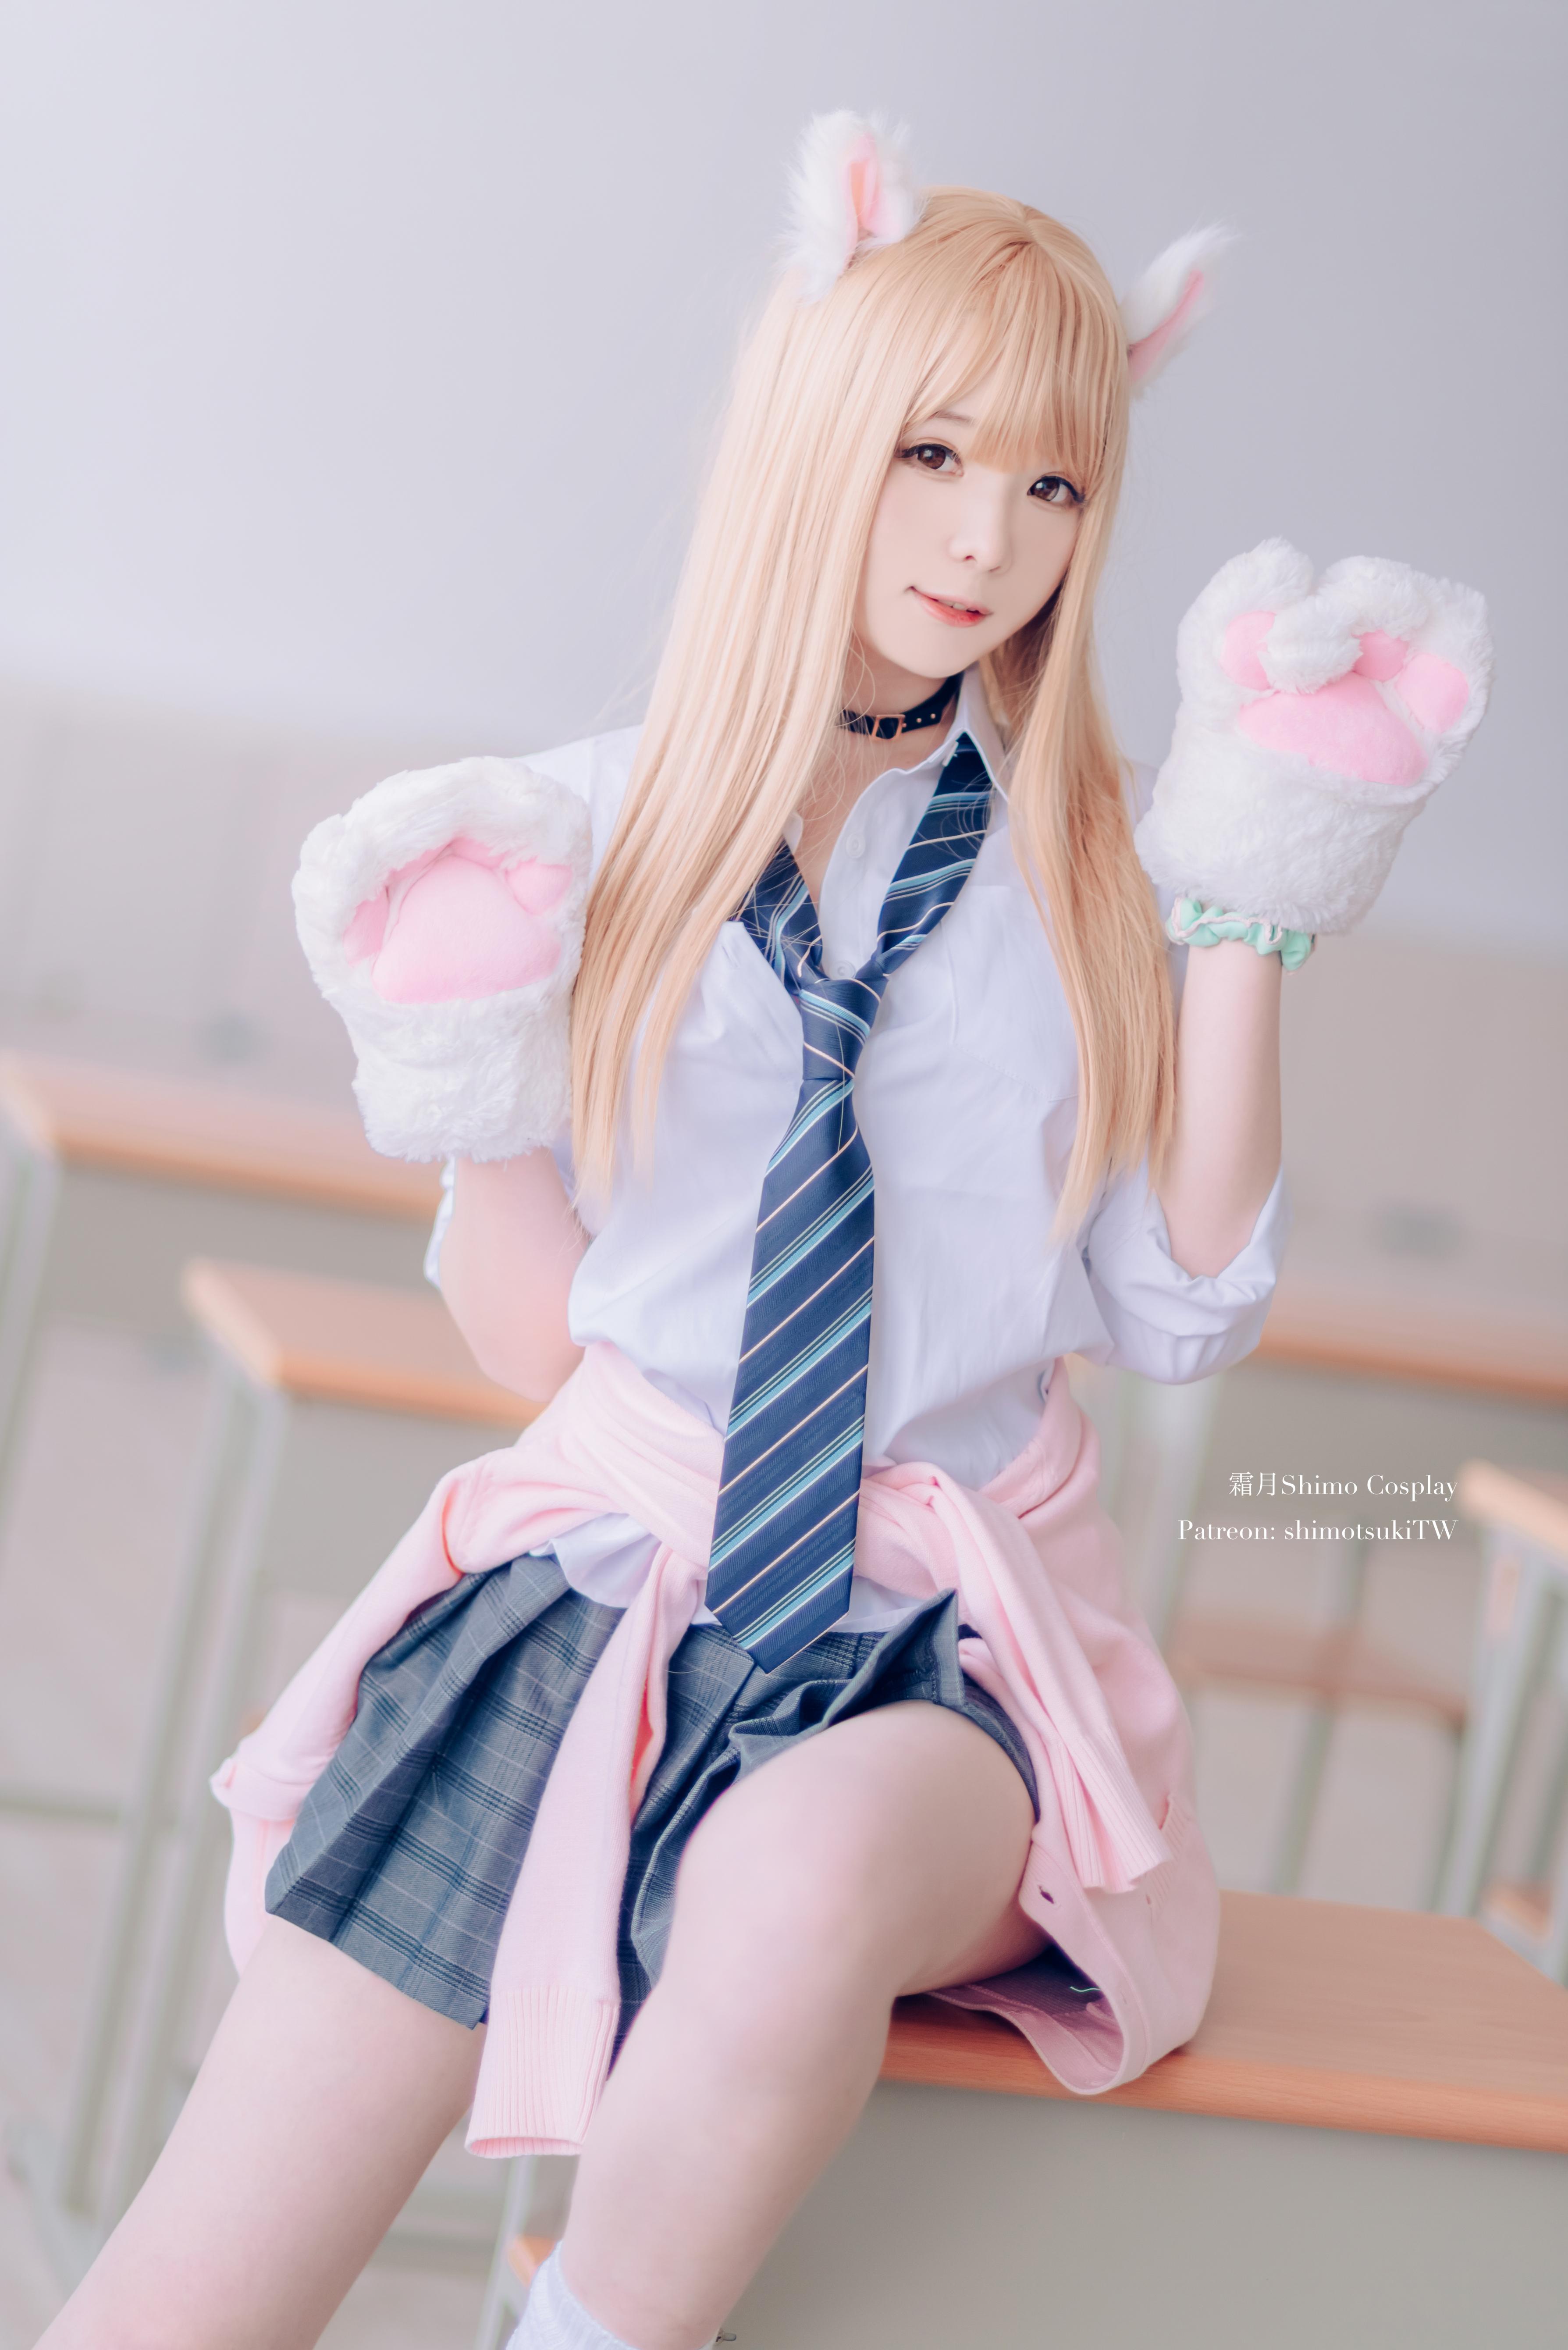 Women Model Asian Cosplay JK Schoolgirl School Uniform Classroom Blonde Bangs Choker Cat Ears Cat Gi 3577x5360